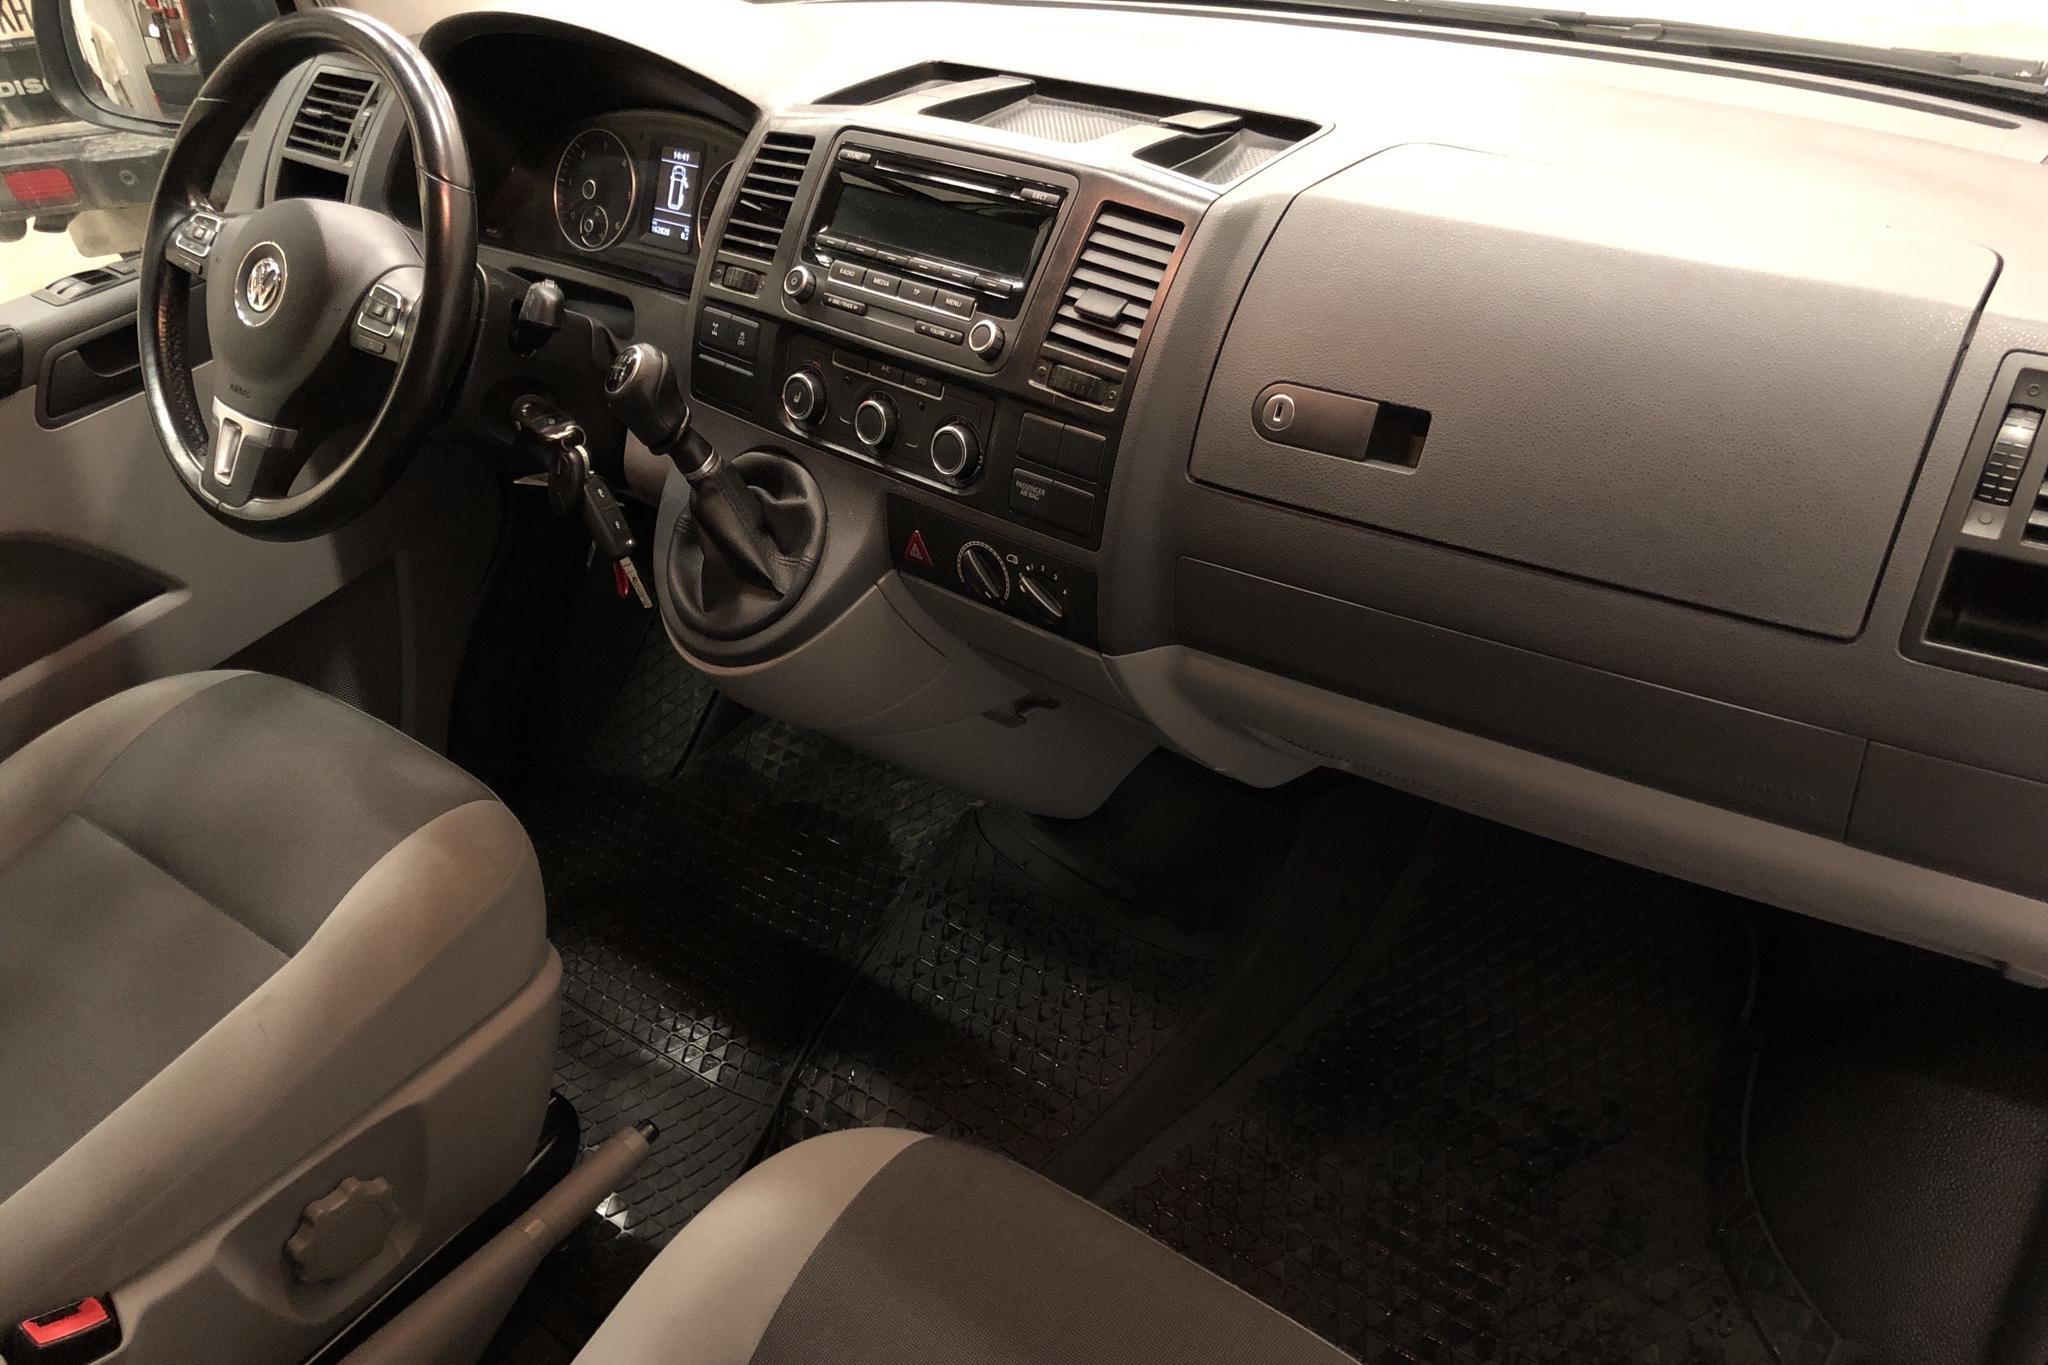 VW Transporter T5 2.0 TDI 4MOTION (140hk) - 162 840 km - Manual - white - 2015